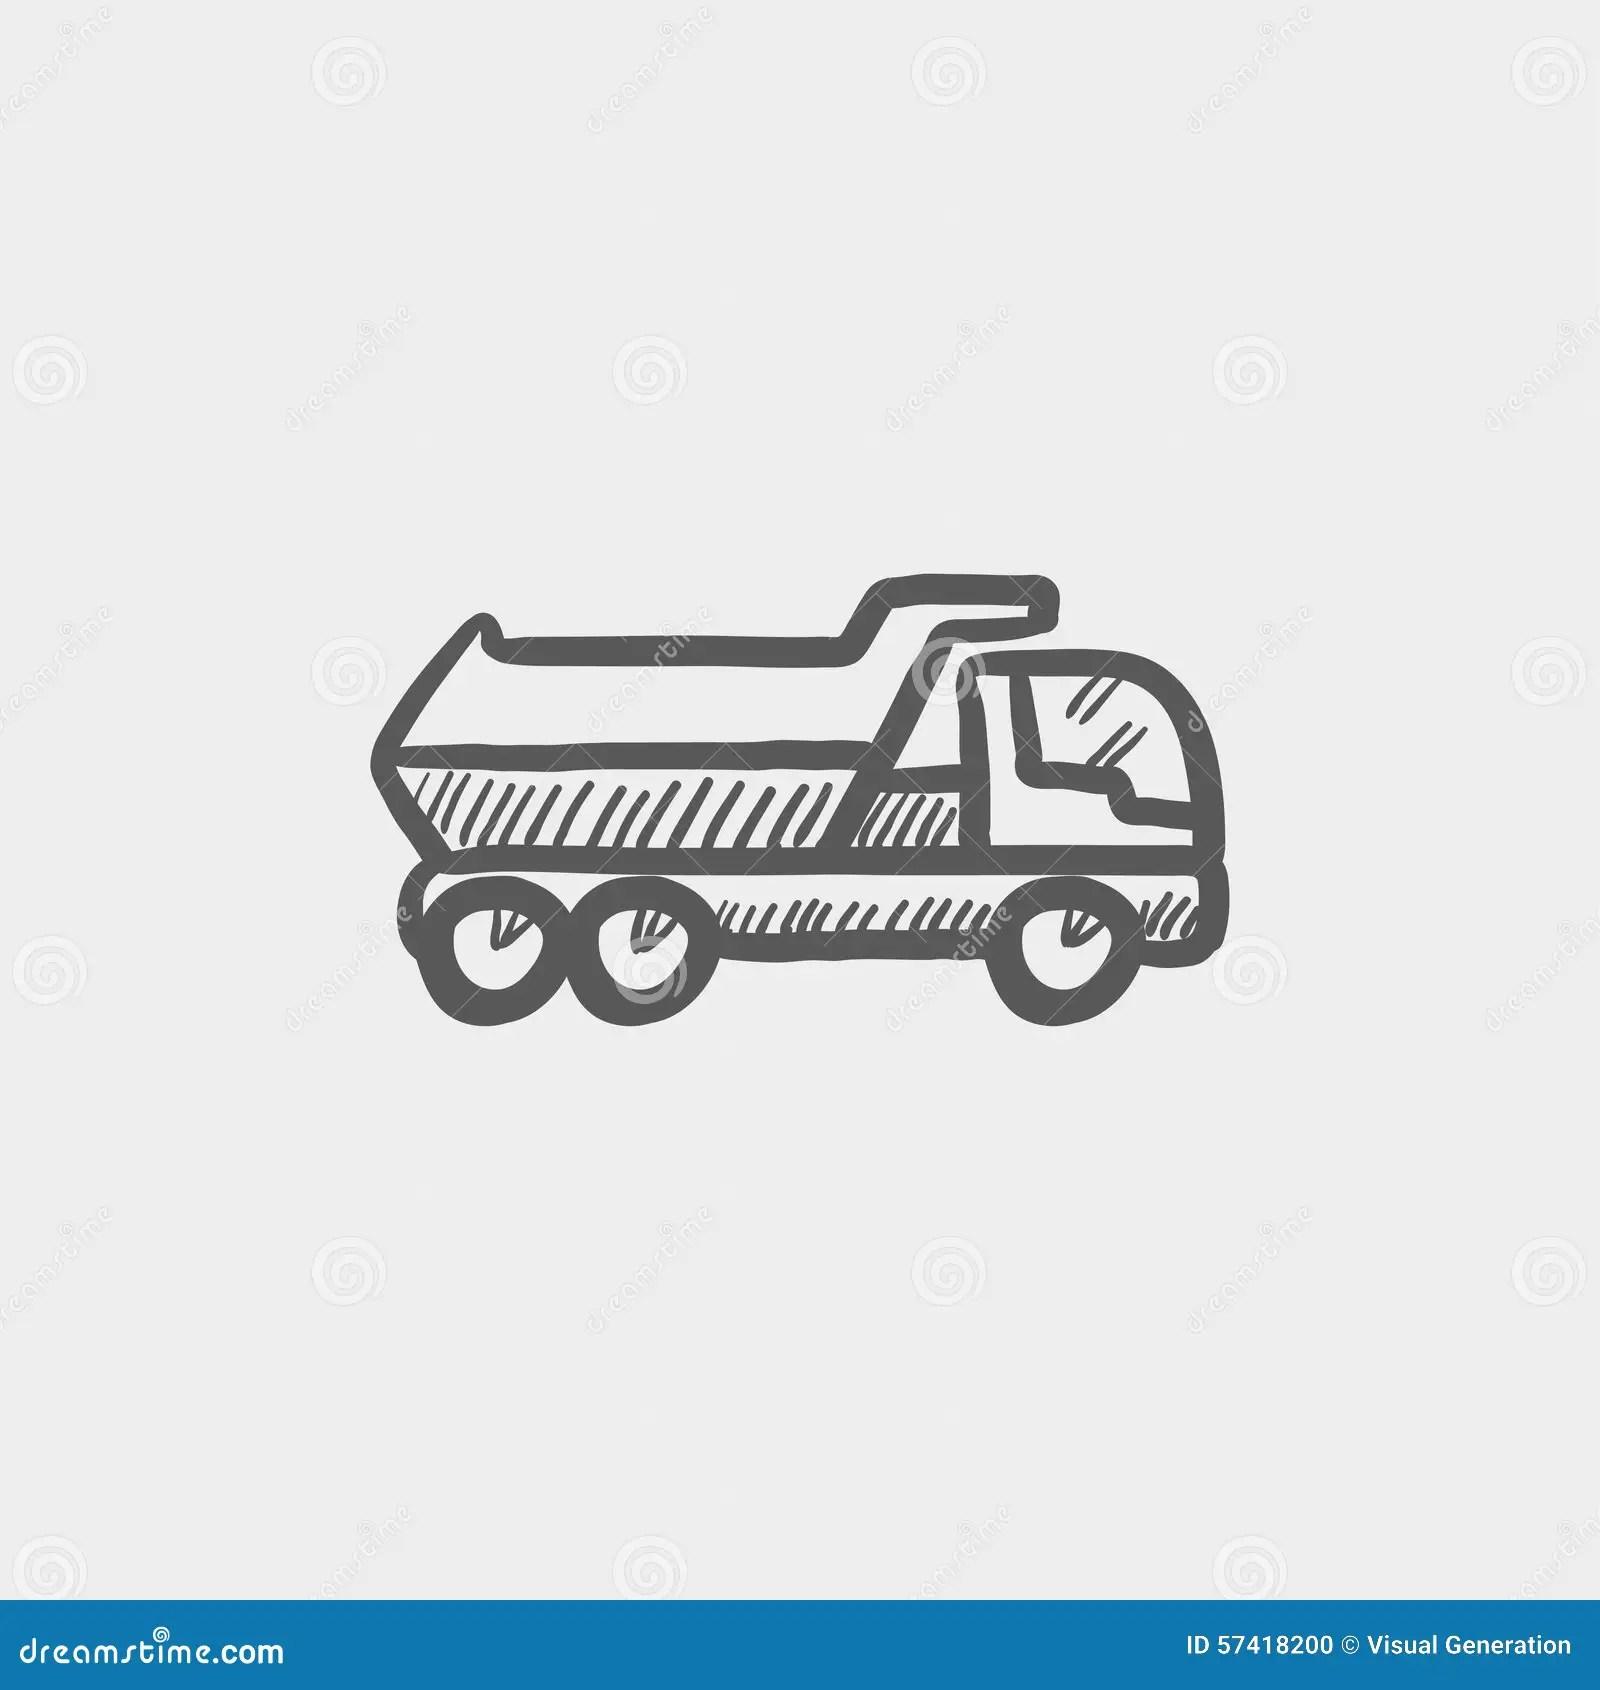 Fuel Supply Truck